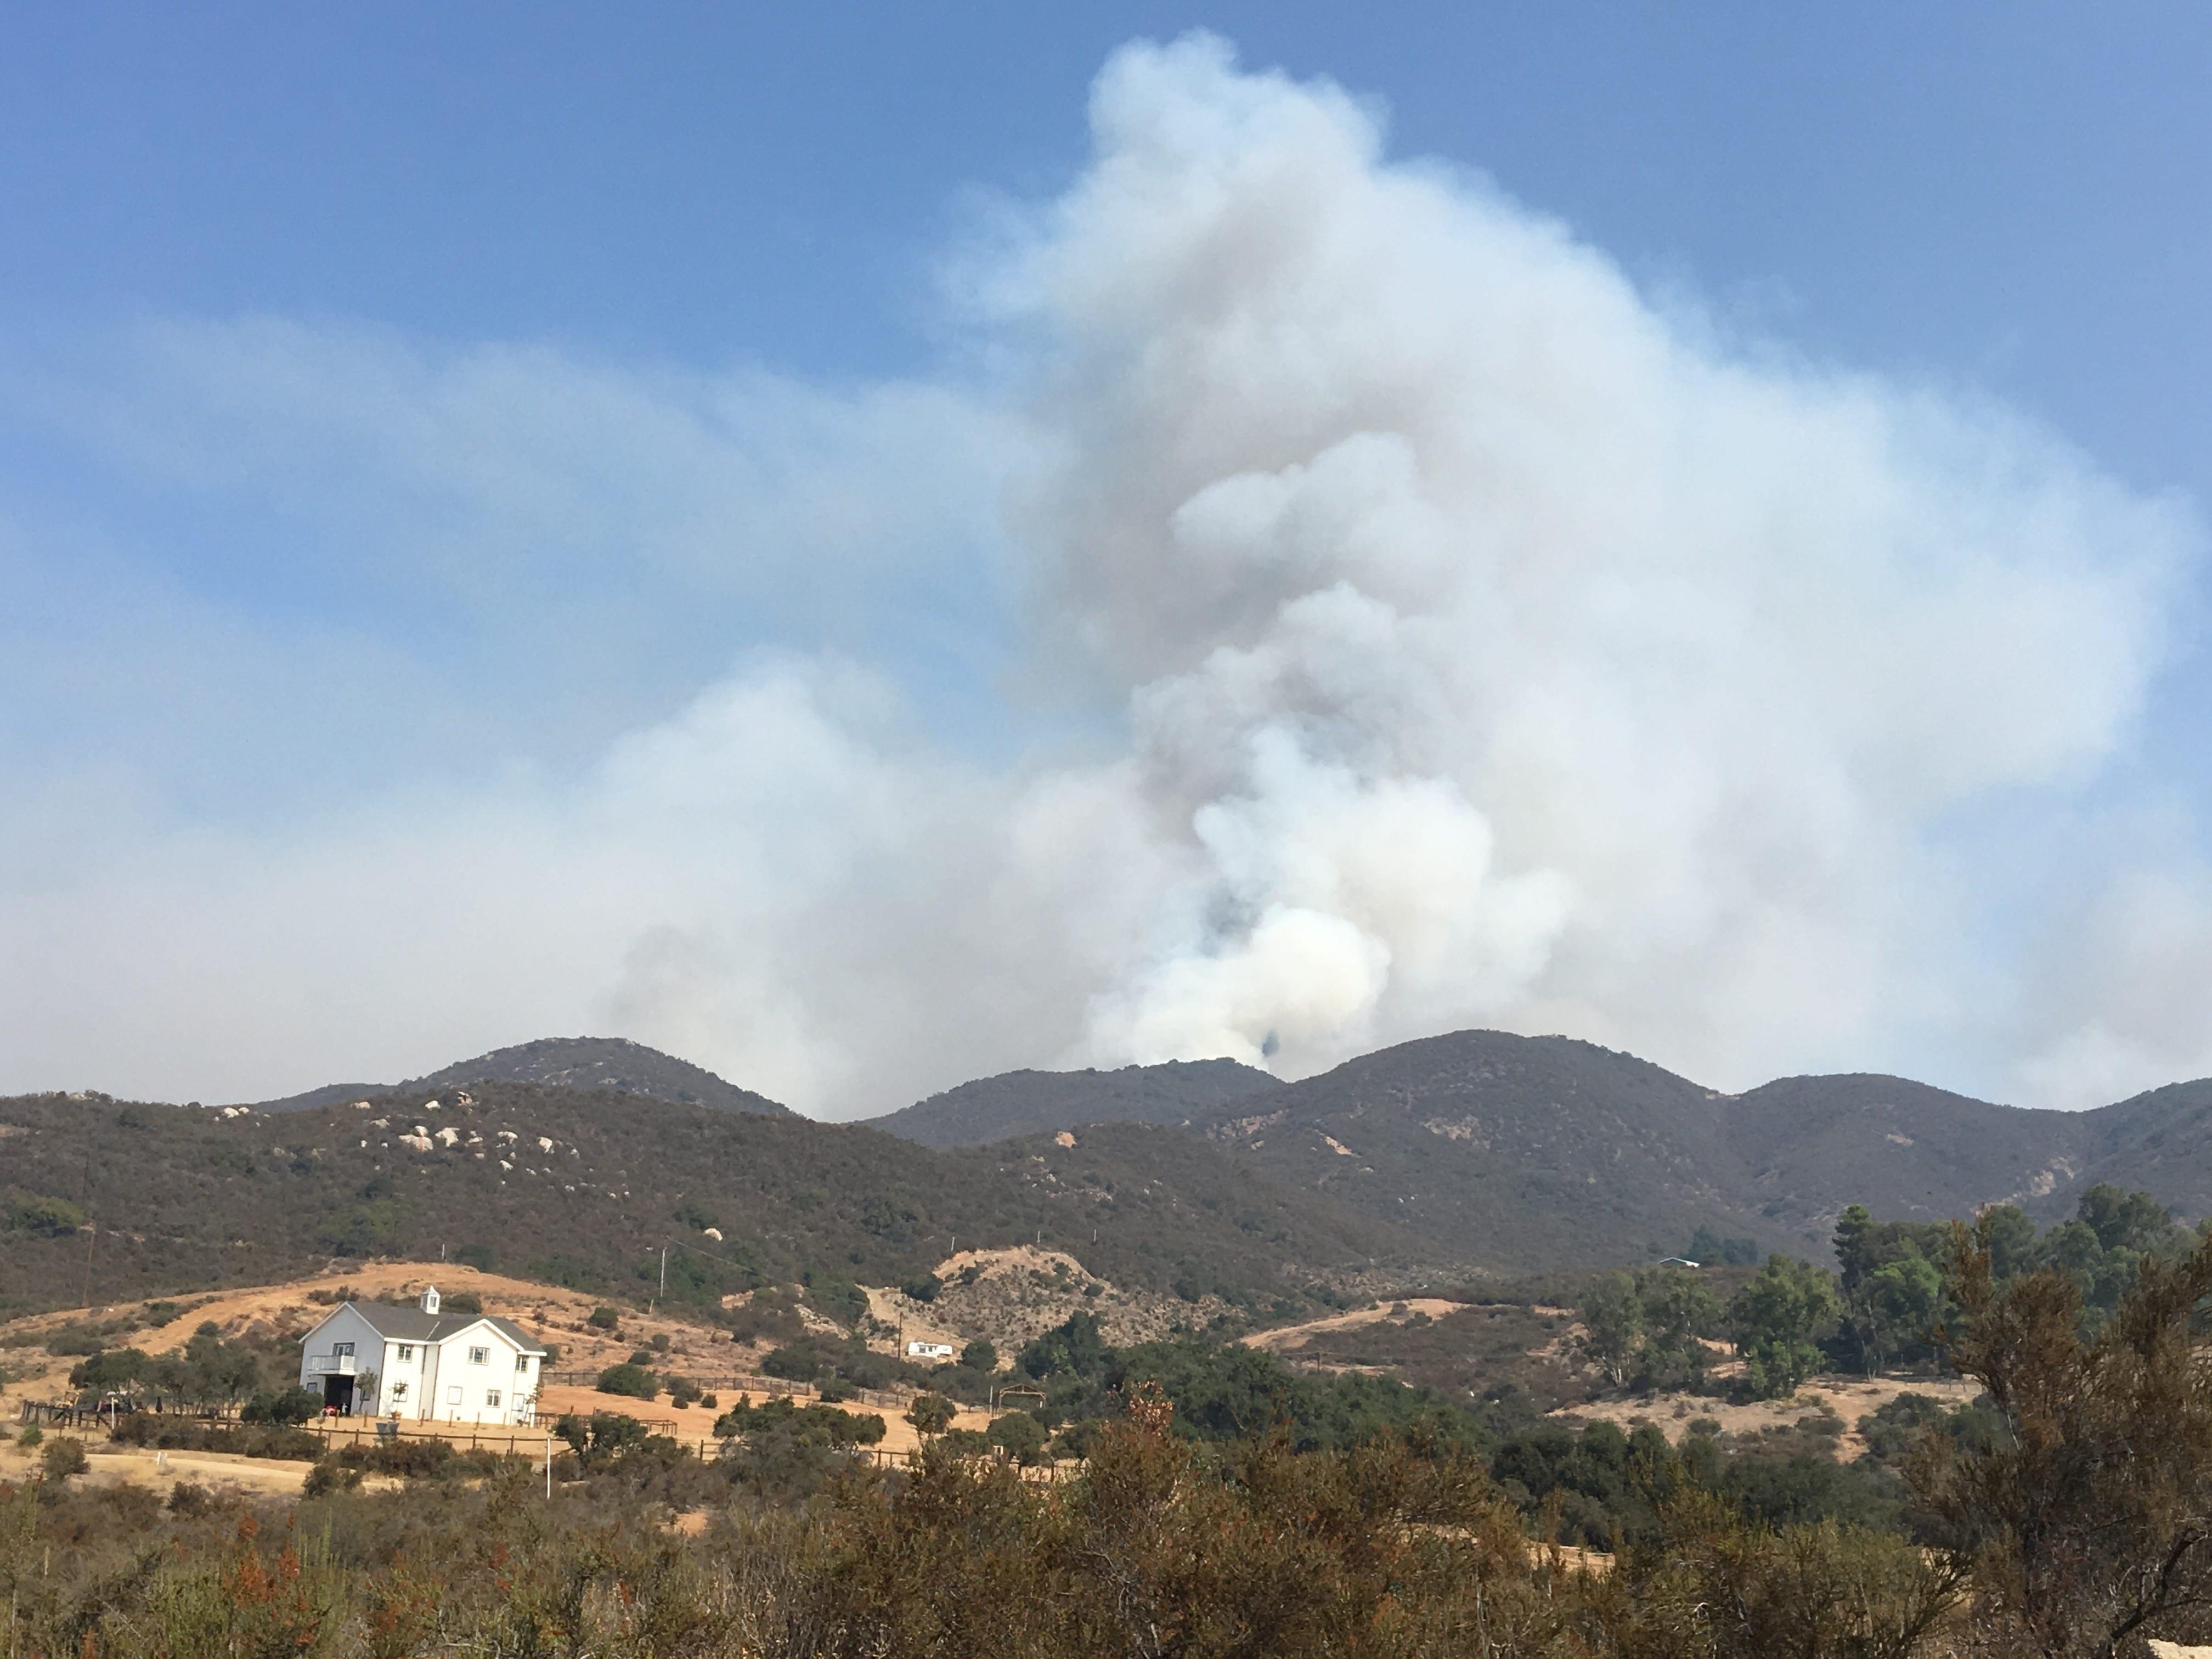 California wildfire: Holy Fire grows; arson suspect awaits arraignment